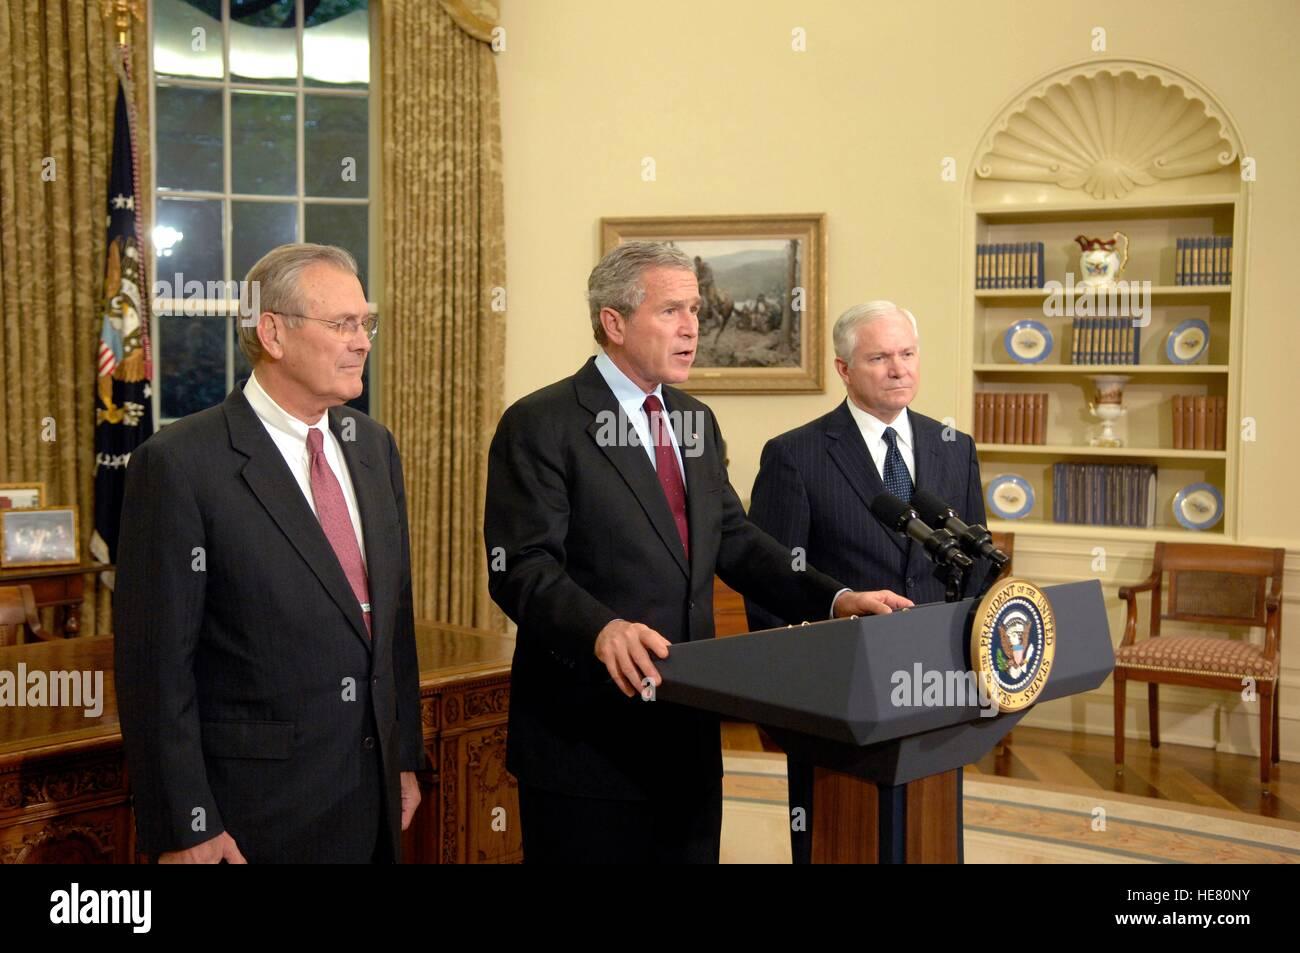 U.S. Secretary of Defense Donald Rumsfeld (left), President George W. Bush, and Secretary of Defense Robert Gates - Stock Image